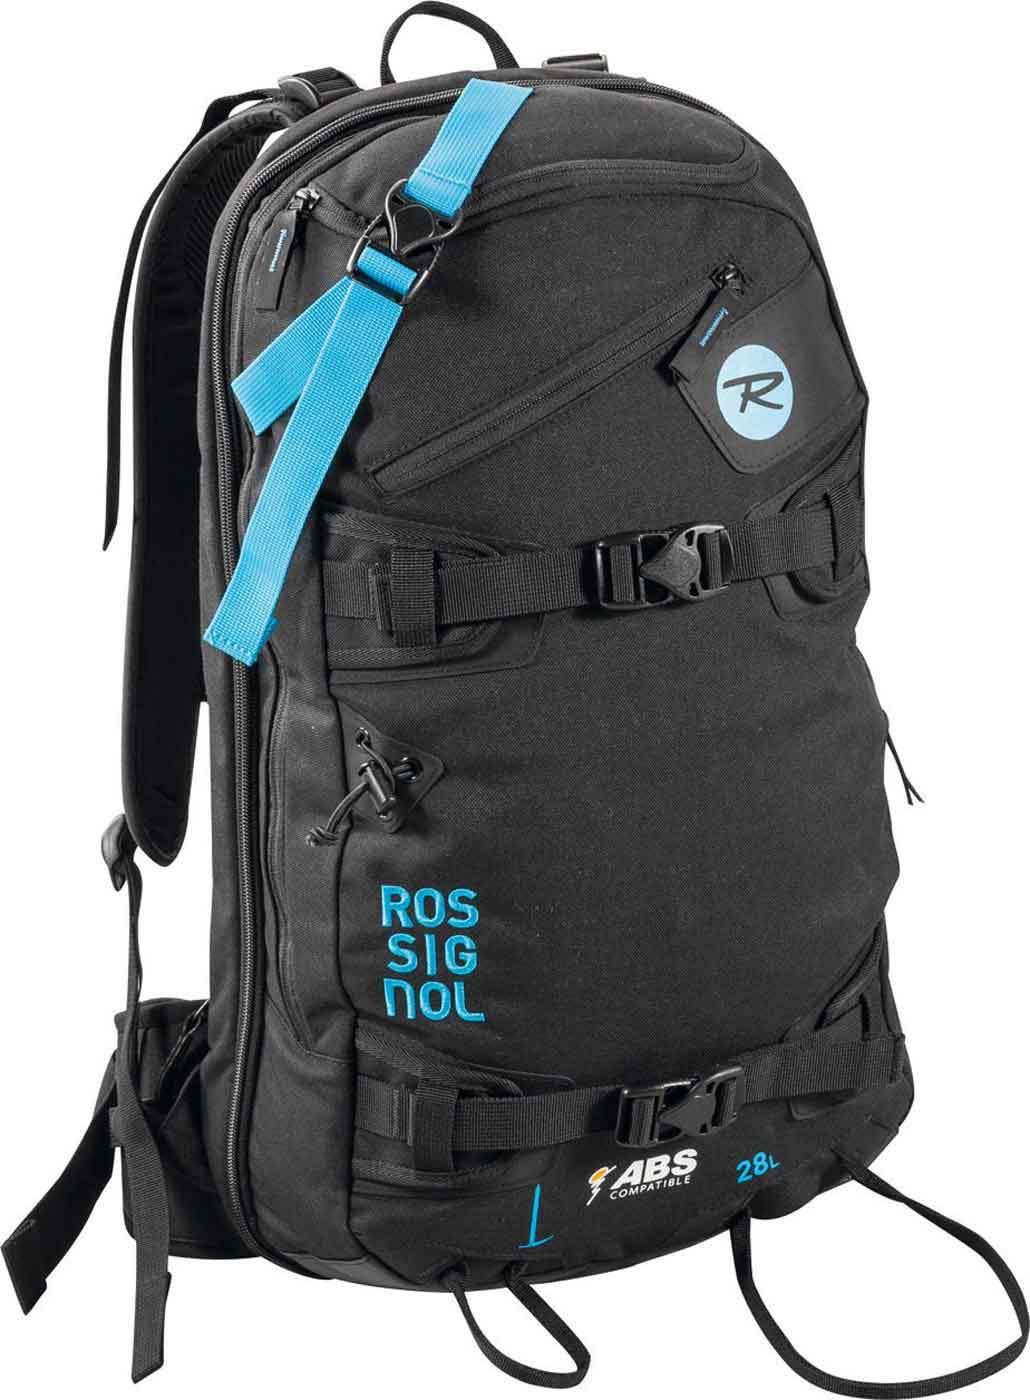 Rossignol ABS Bag Compatible